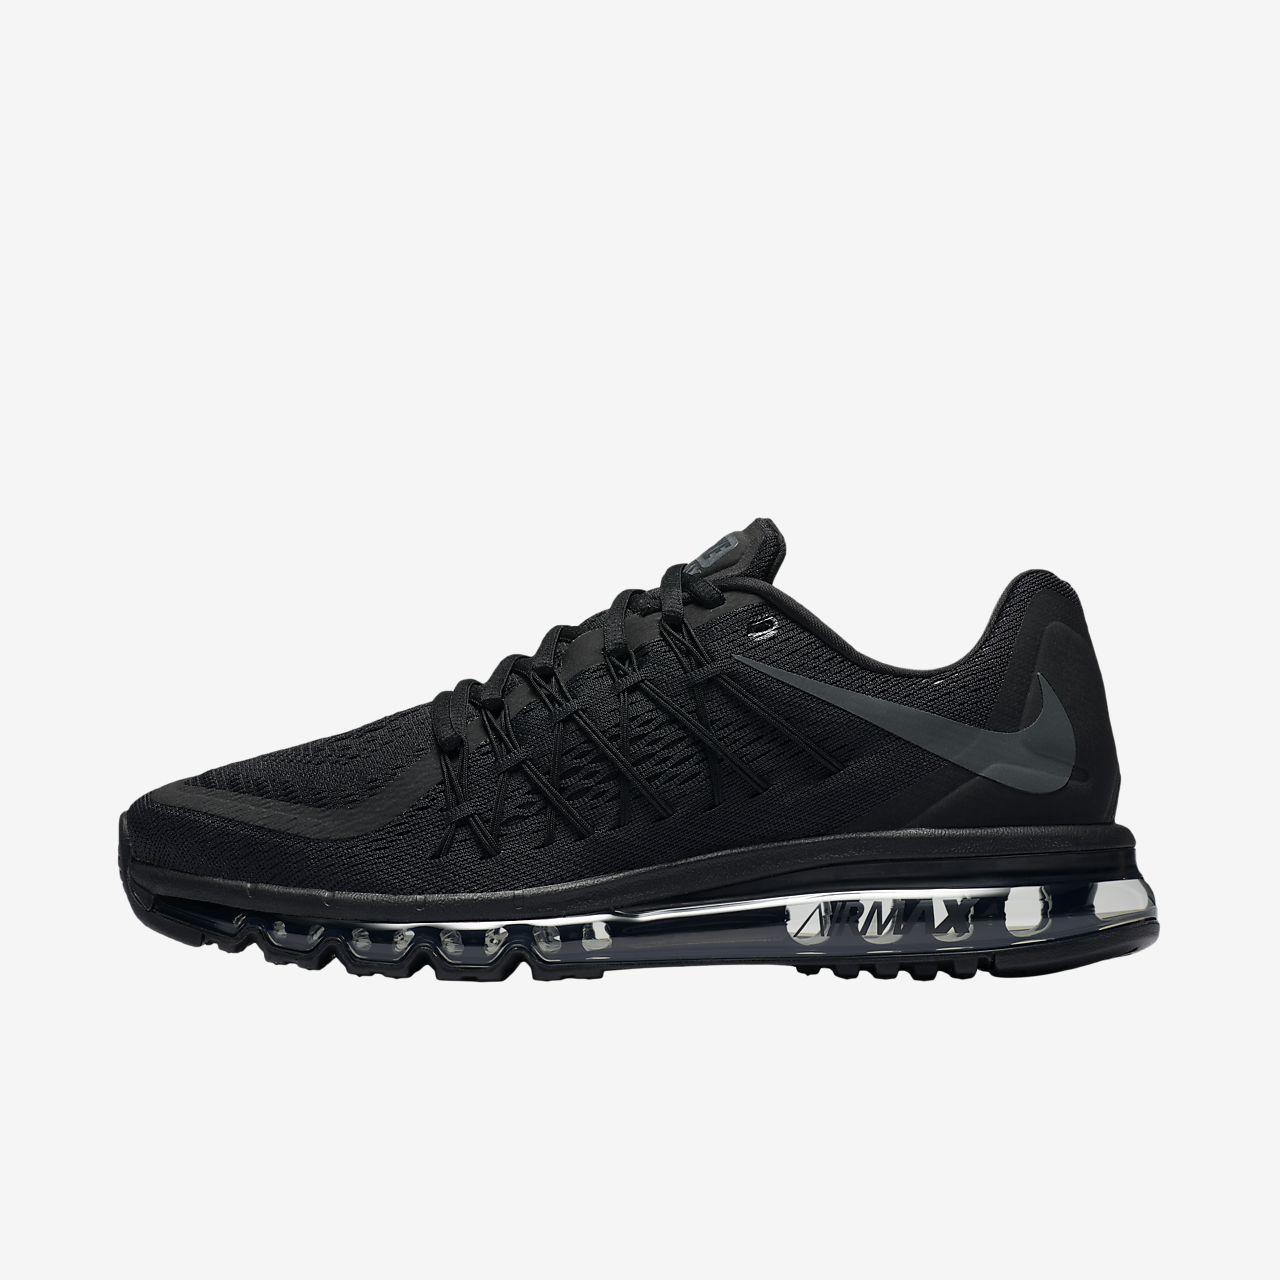 f024cef2ab1f Chaussure Nike Air Max 2015 pour Homme. Nike.com FR